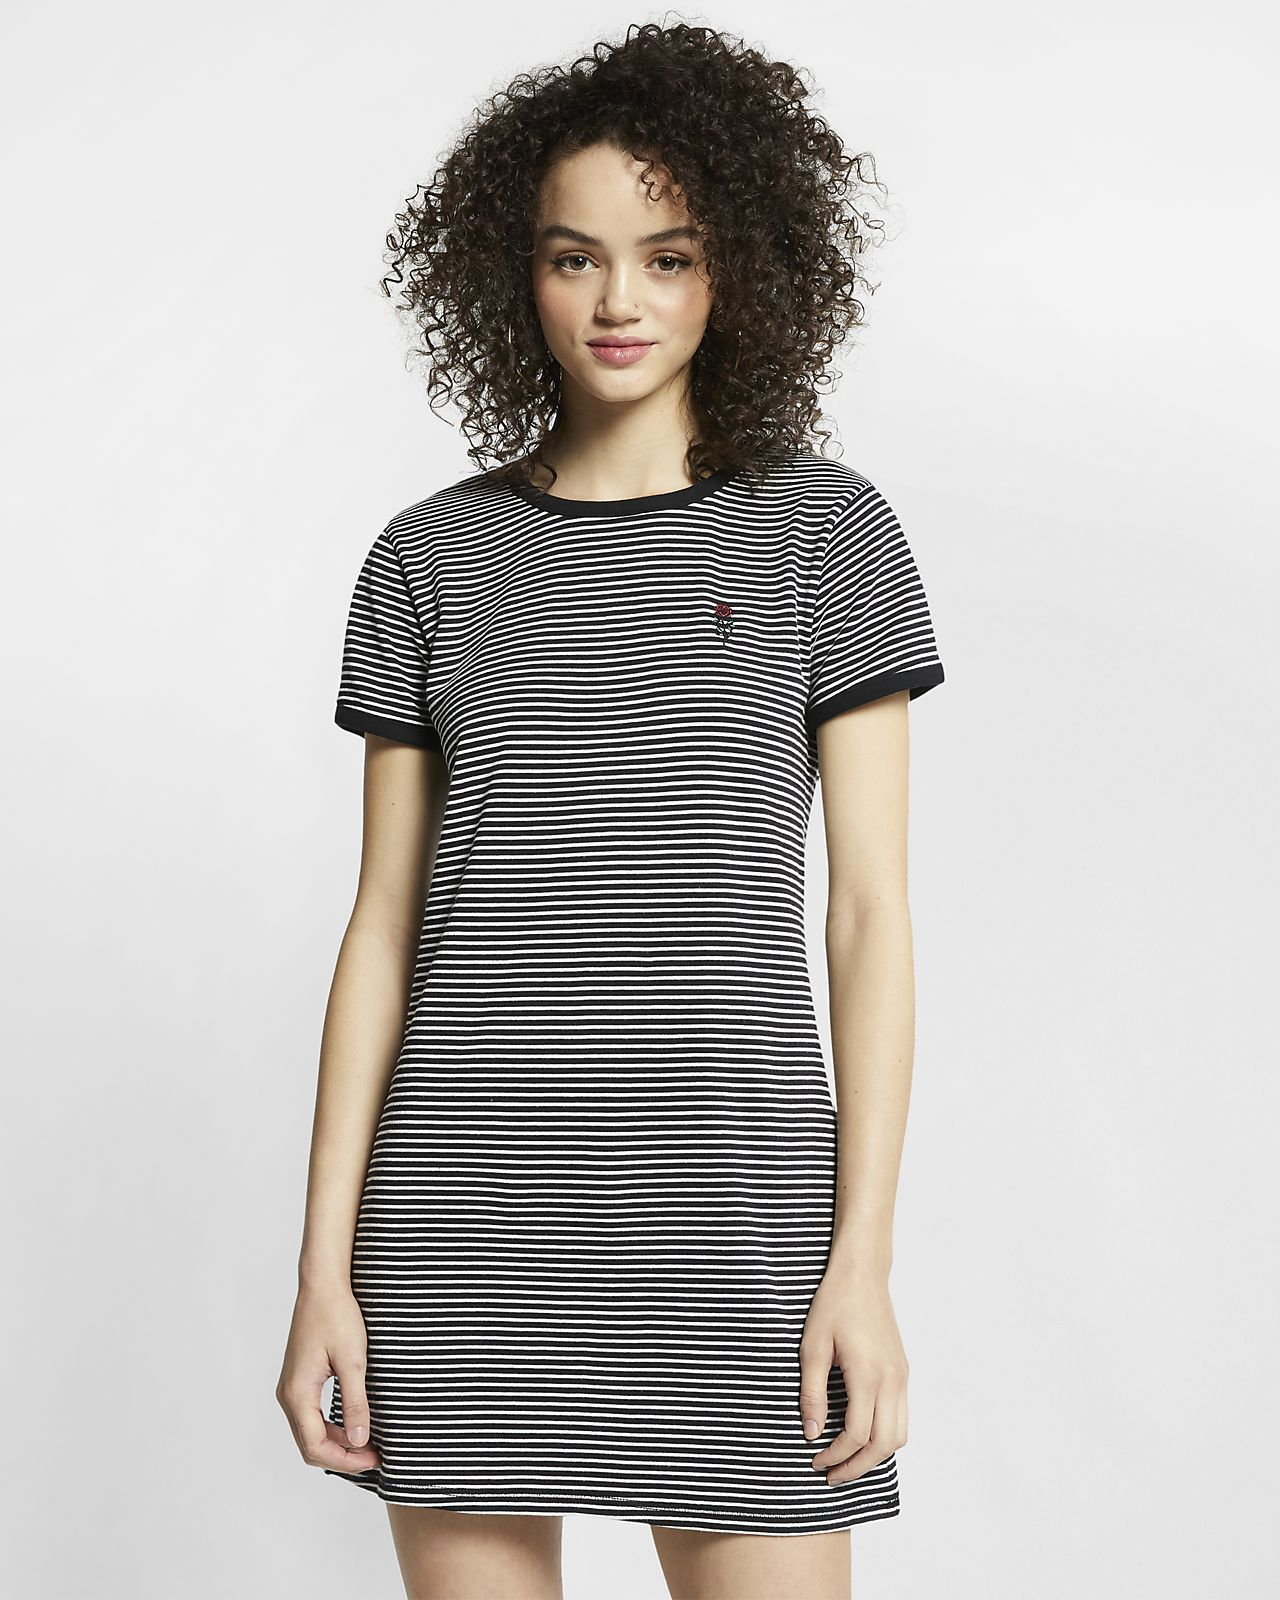 Hurley Rose Women's Striped Dress